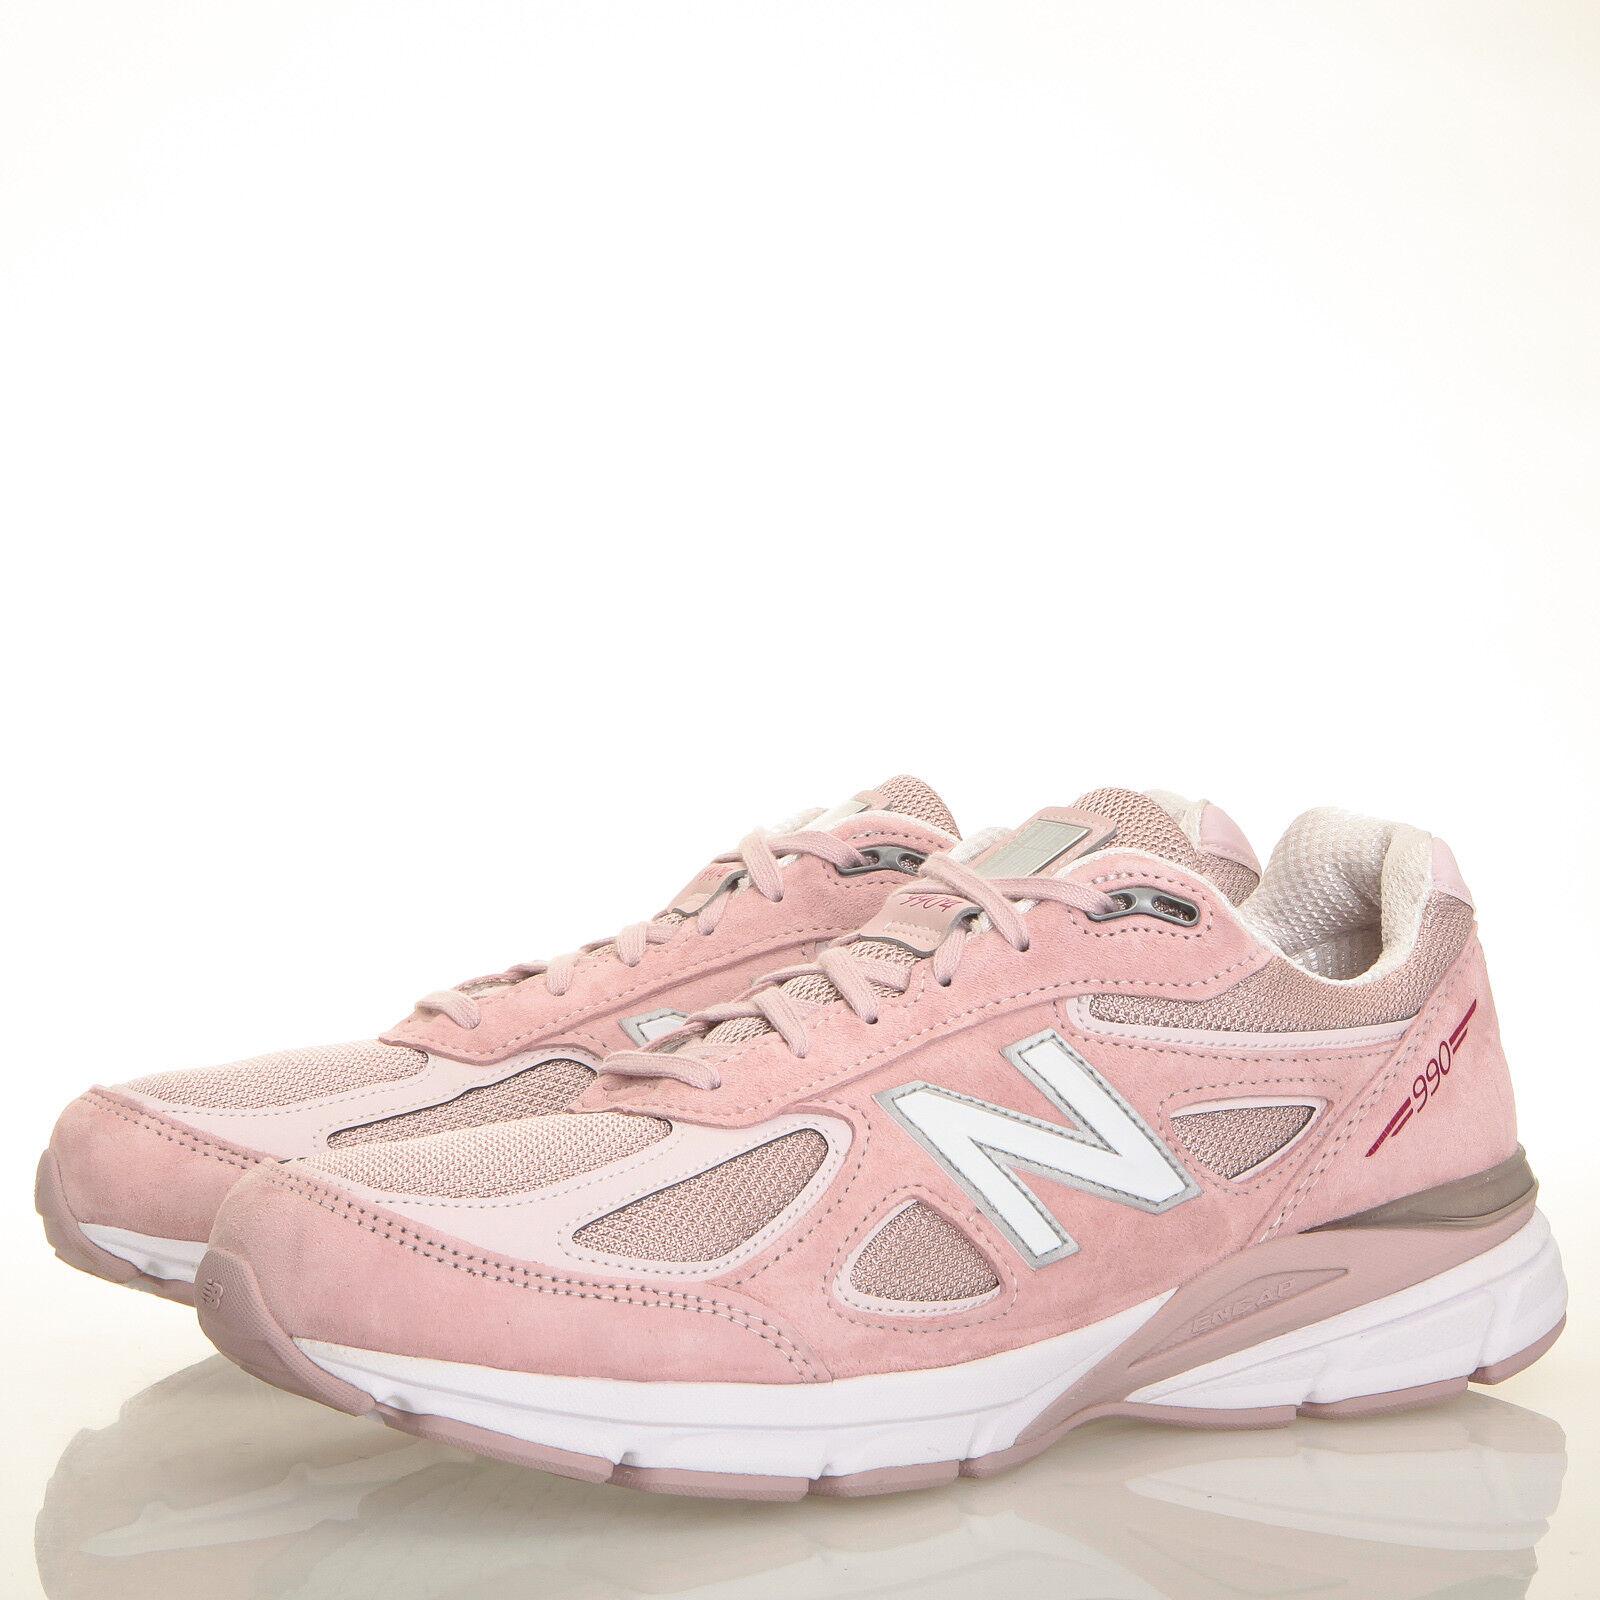 New Balance 990 Faded Rose Komen esecuzione rosa In esecuzione Komen In esecuzione rosa scarpe ... ba30a7